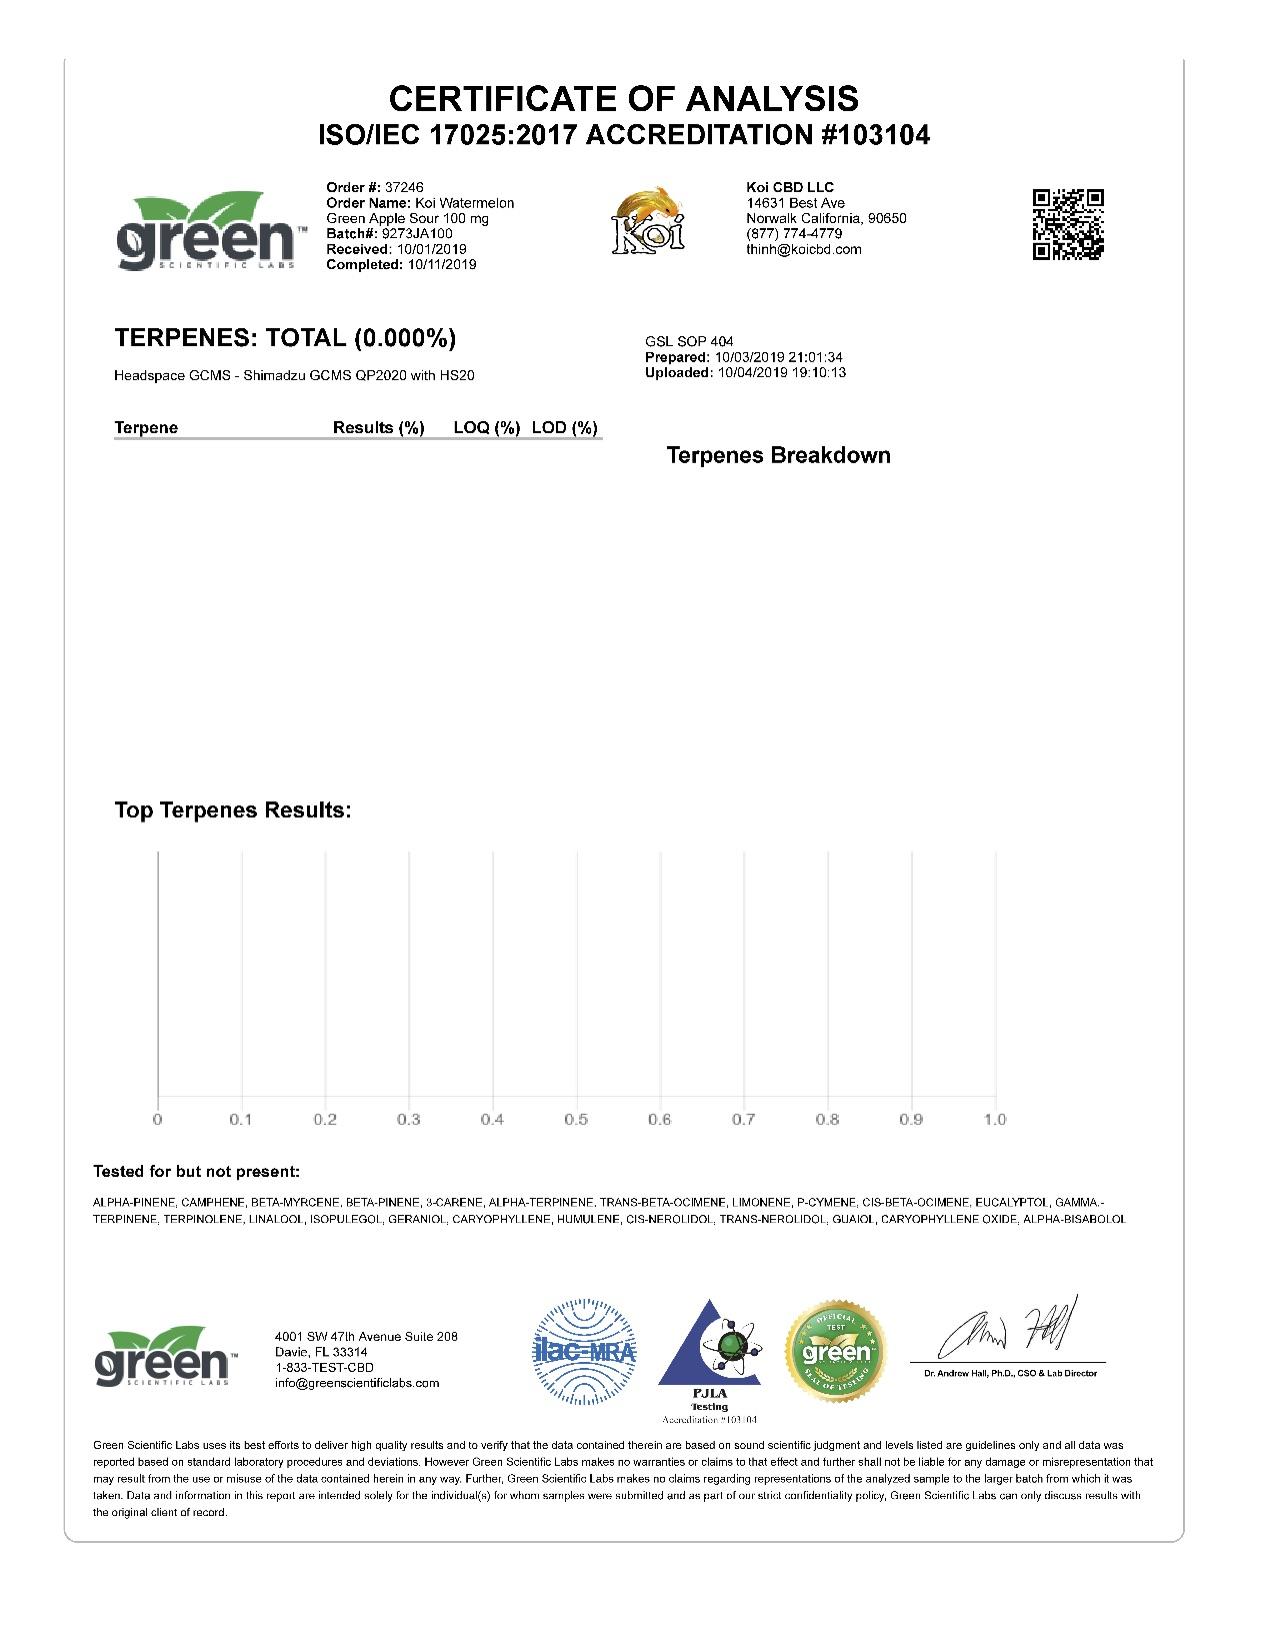 Koi CBD Watermelon Green Apple Sour Vape Oil 100mg page2